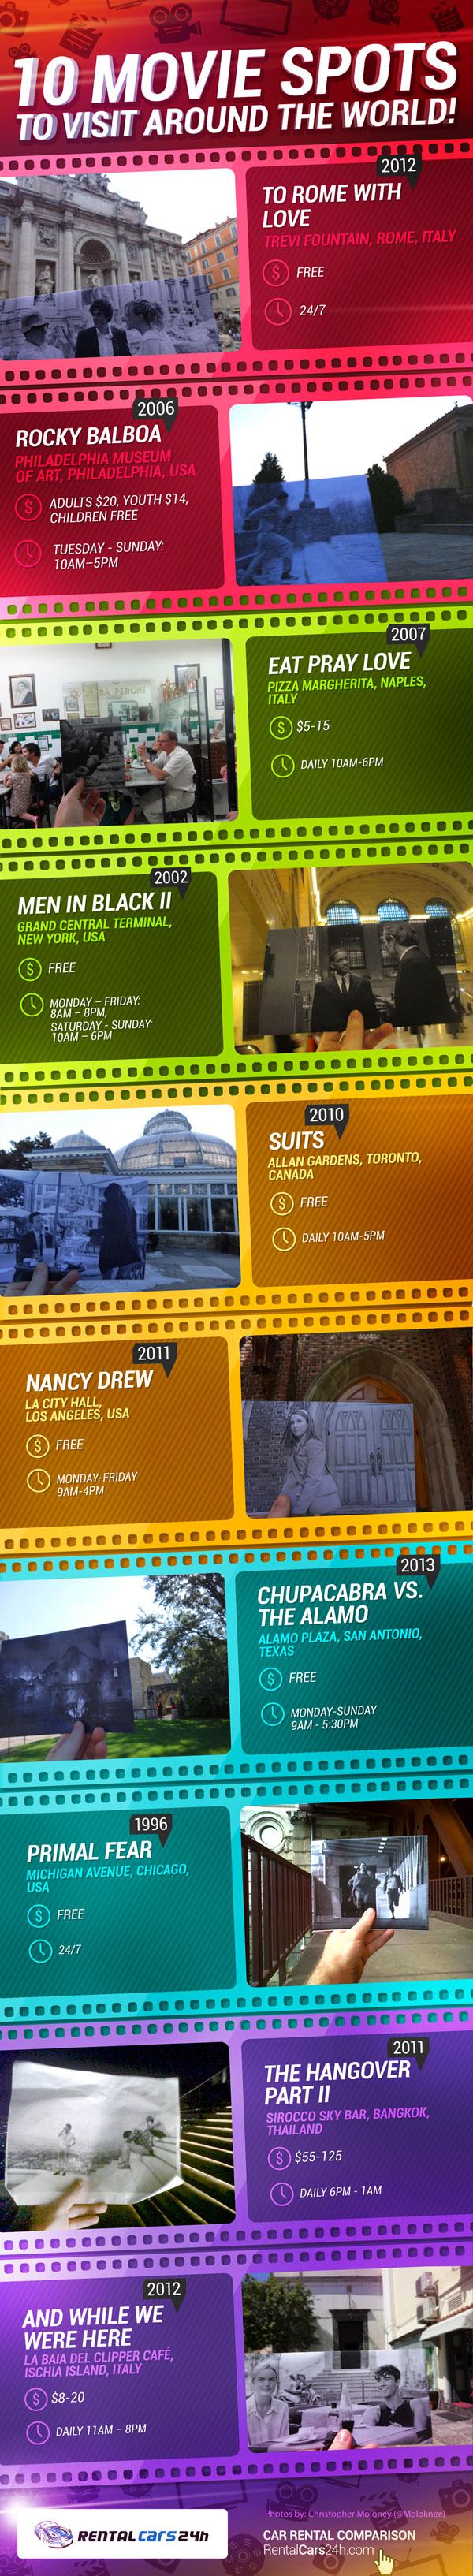 Films 10 Movie Spots To Visit Around The World!